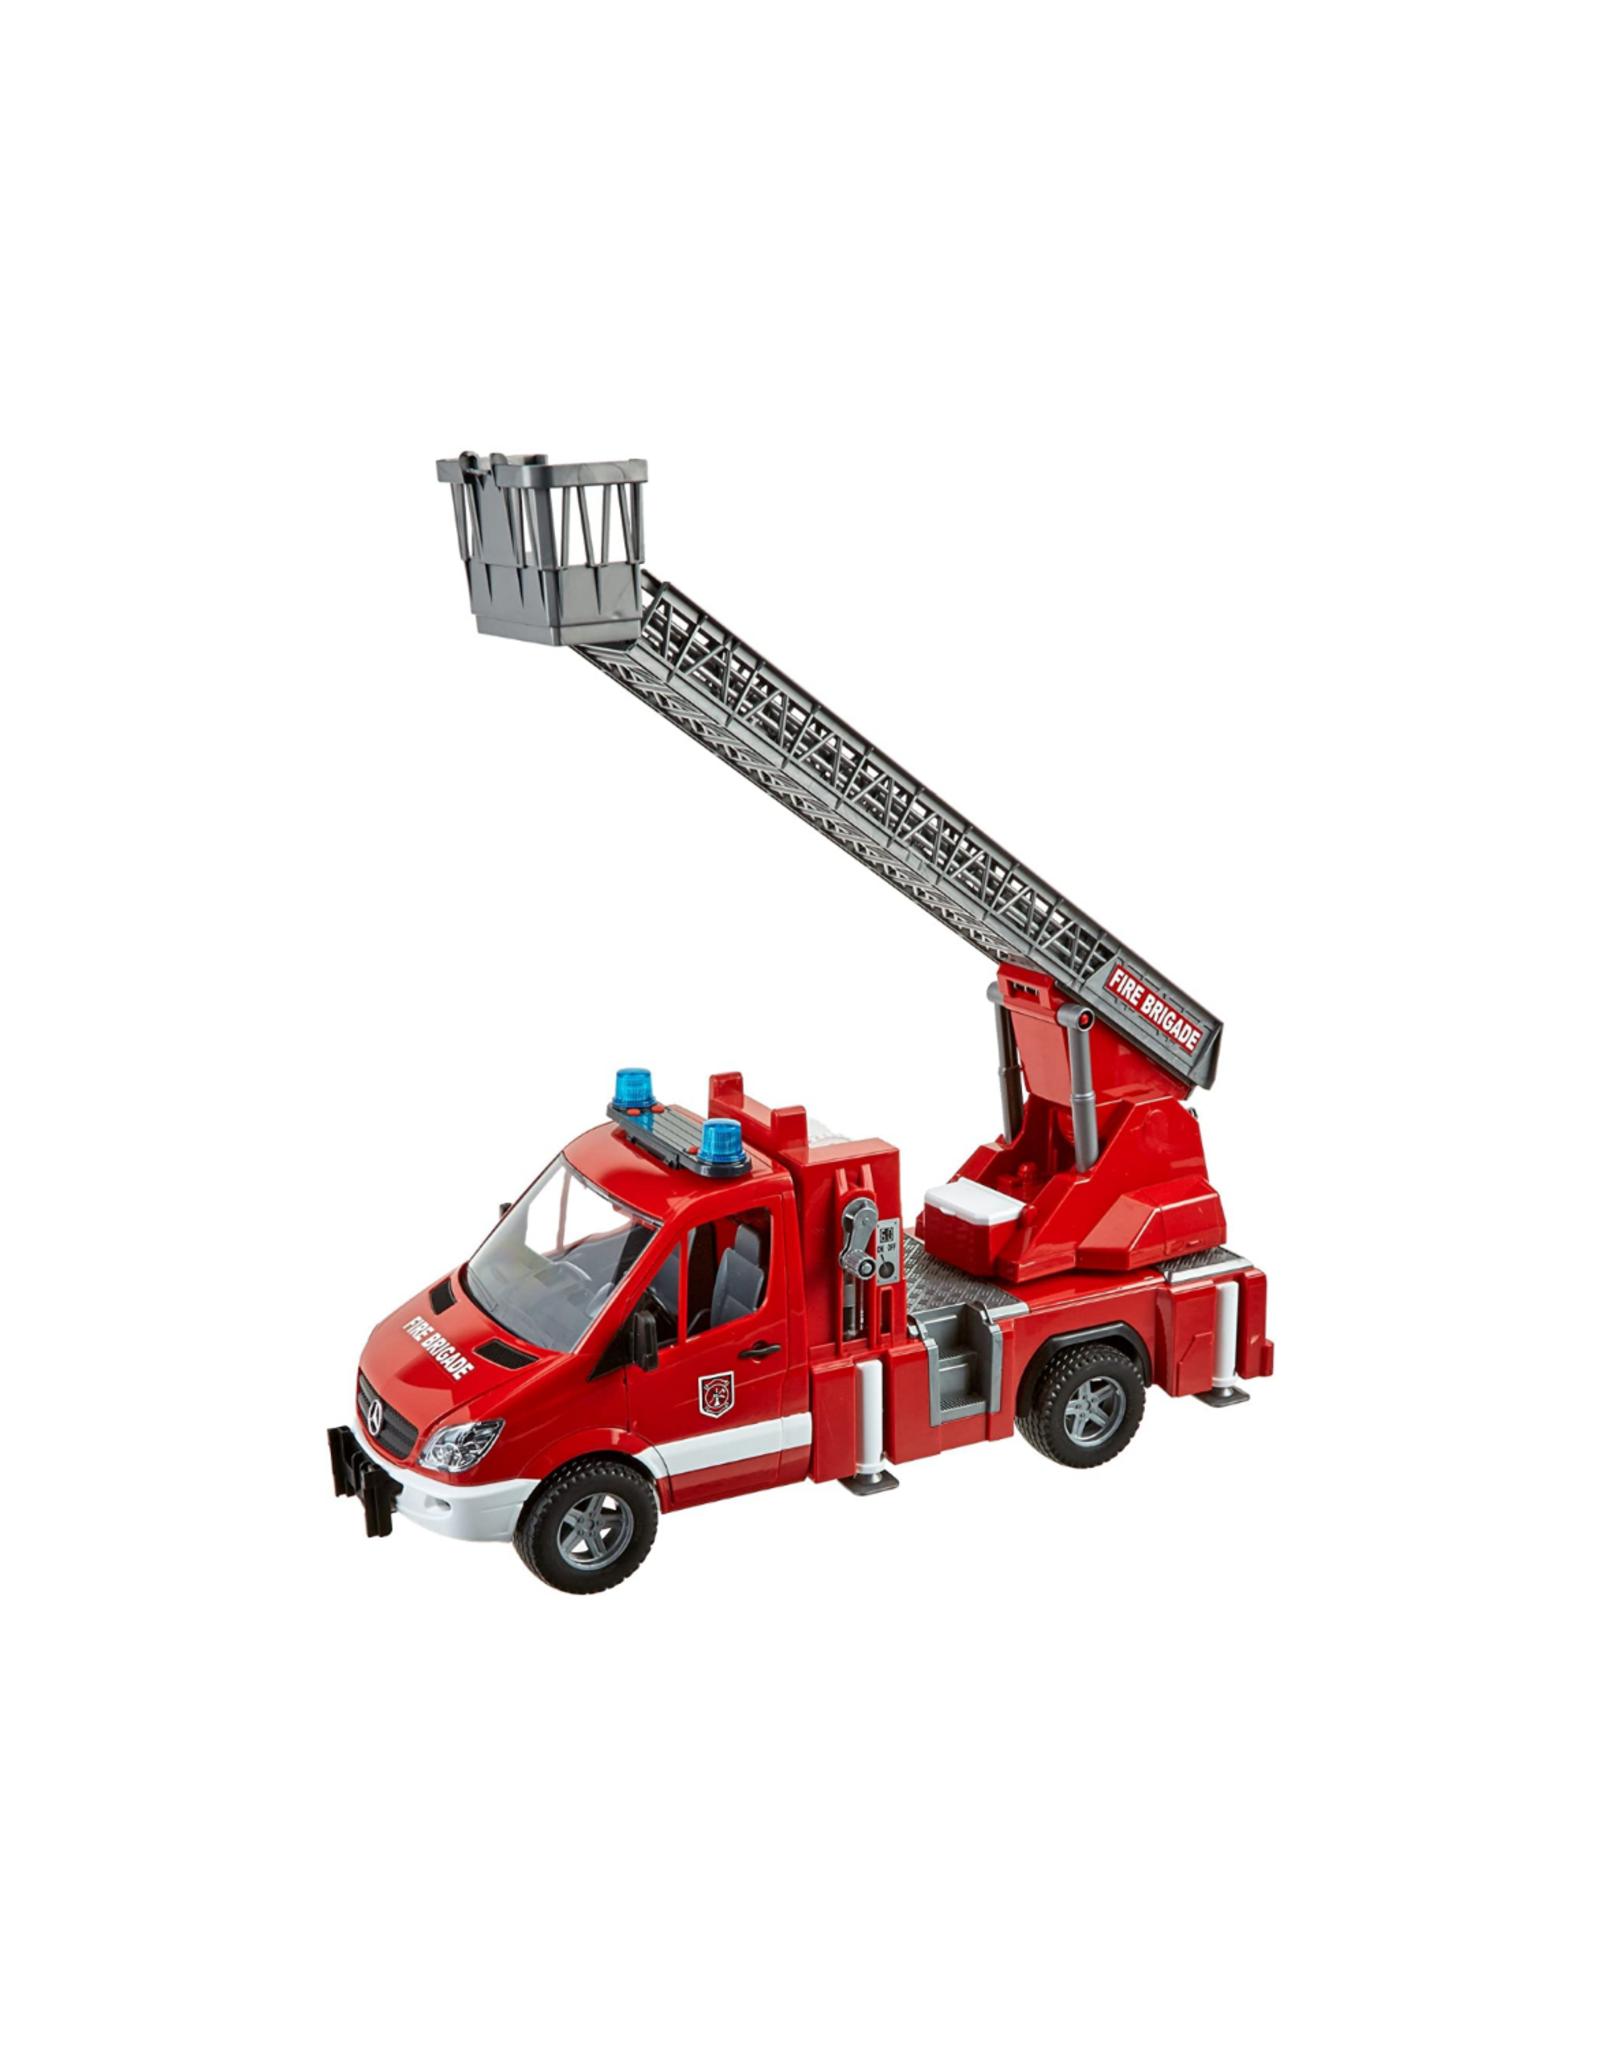 MB Sprinter Fire Engine w/ Water Pump, Light/sound